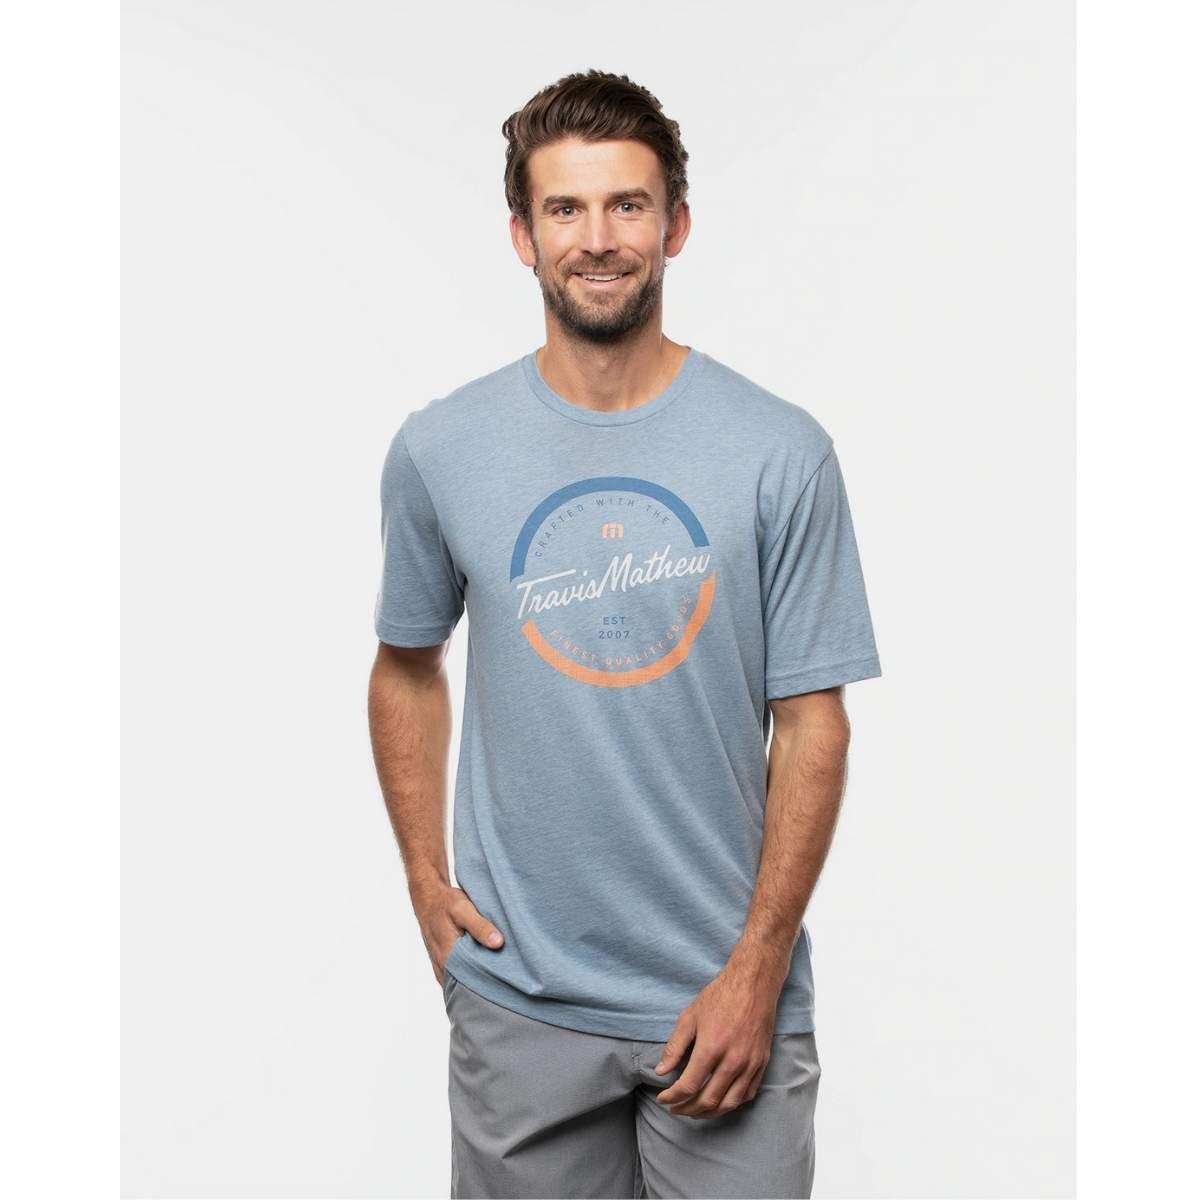 TravisMathew 2021 Mixologist T-Shirt